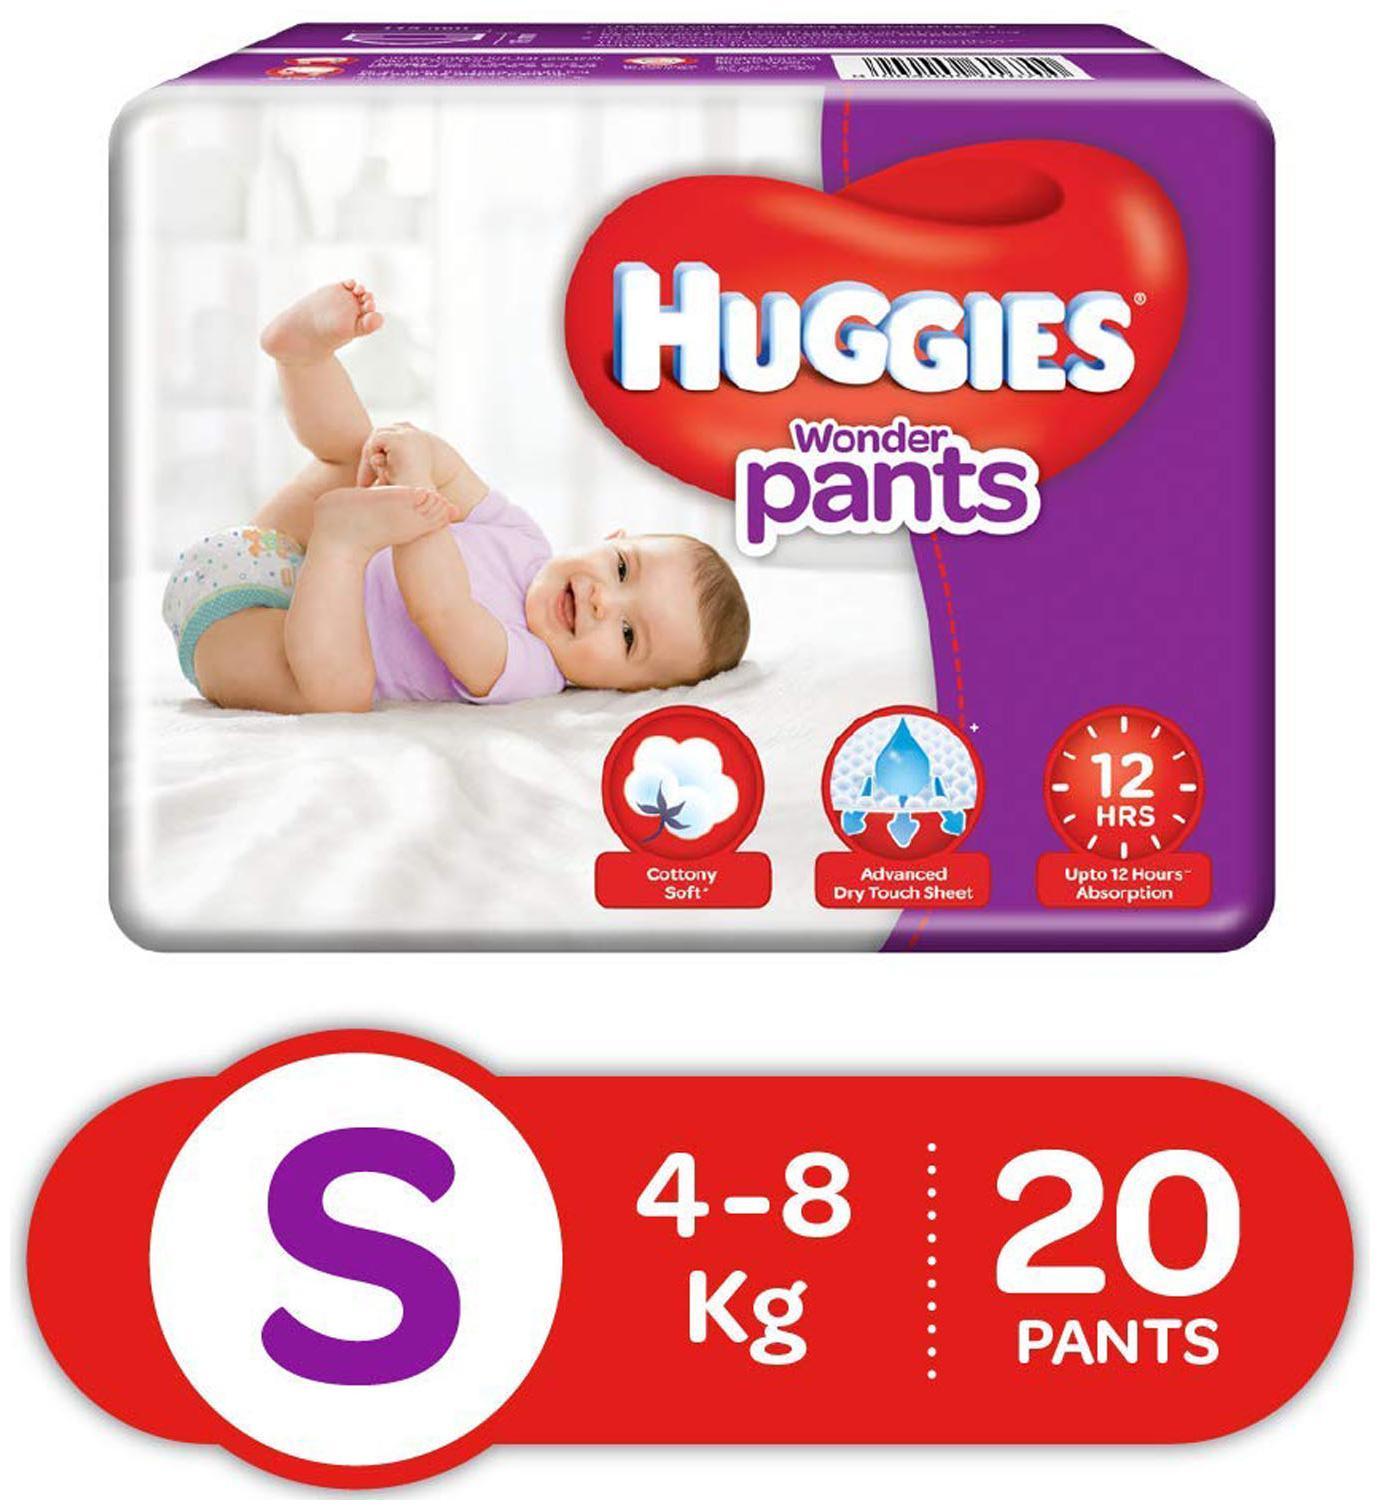 Huggies Wonder Pants S 20 pcs by Apollo Pharmacy